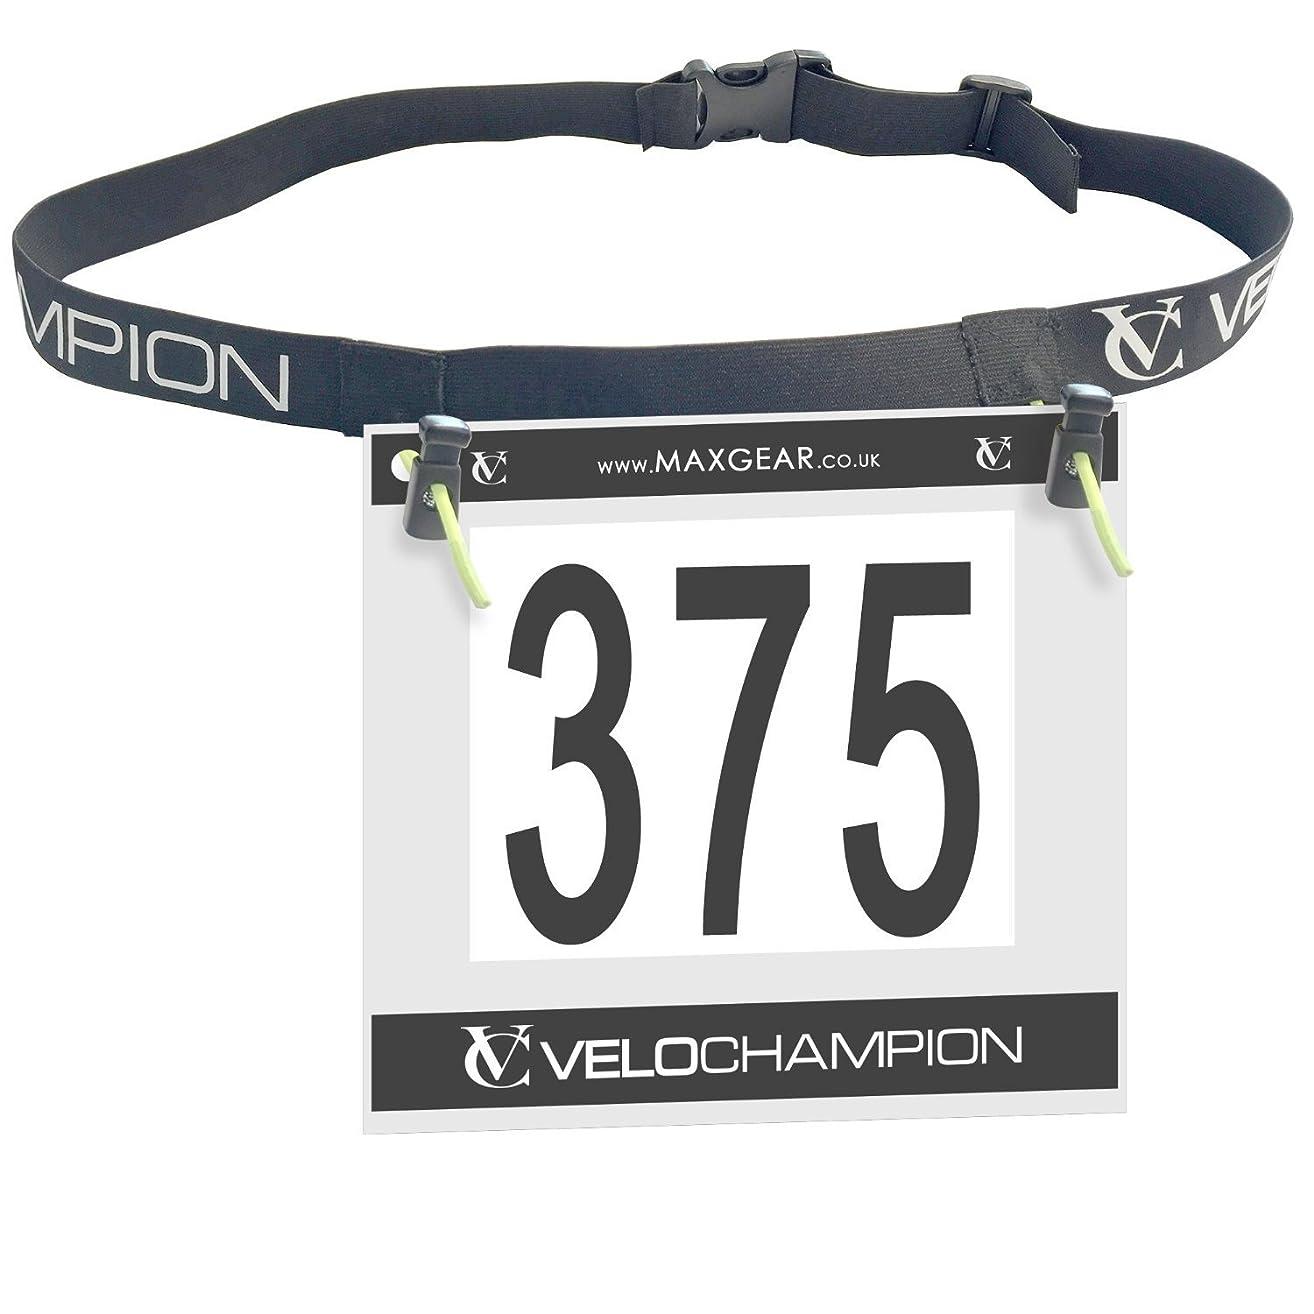 VeloChampion Marathon Triathlon/Runners Running Race BIB Waist Hip Holders Number Card Belt